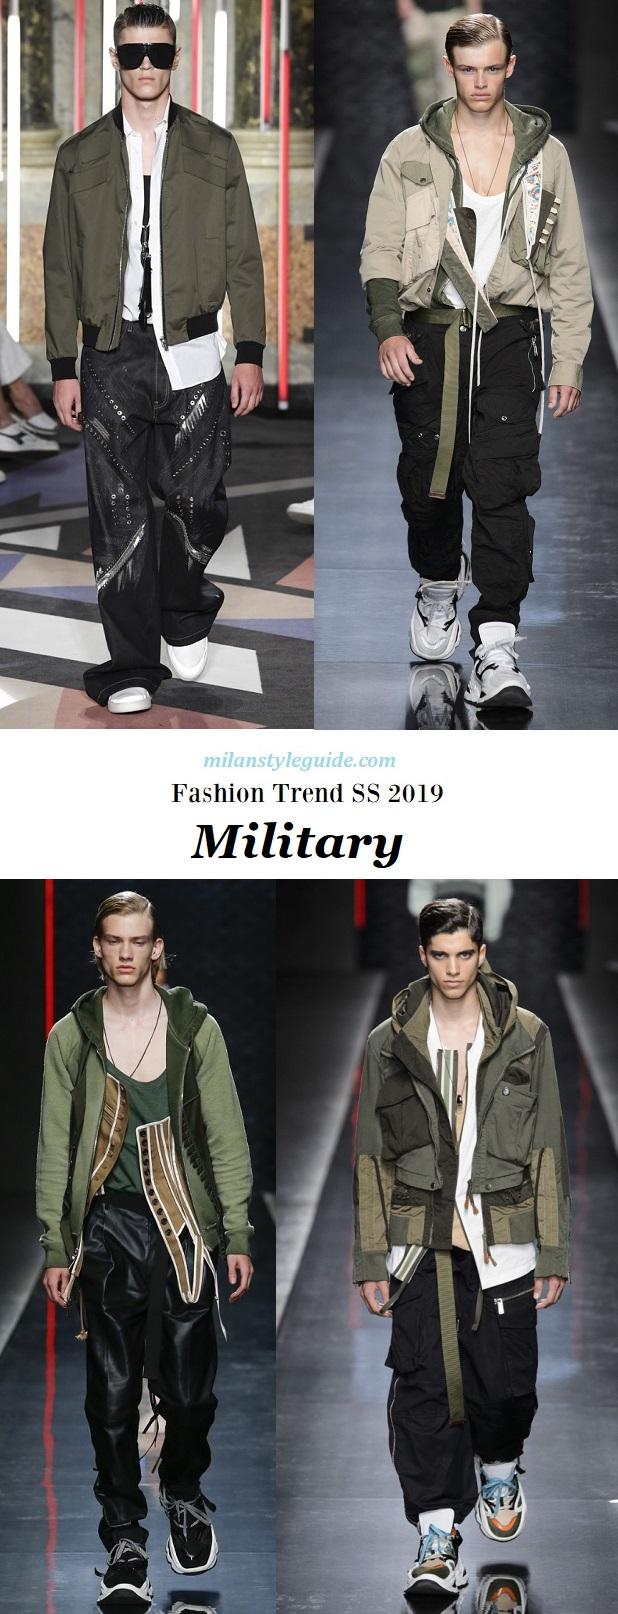 модная тенденции 2019 fashion trend SS 2019 Millitary